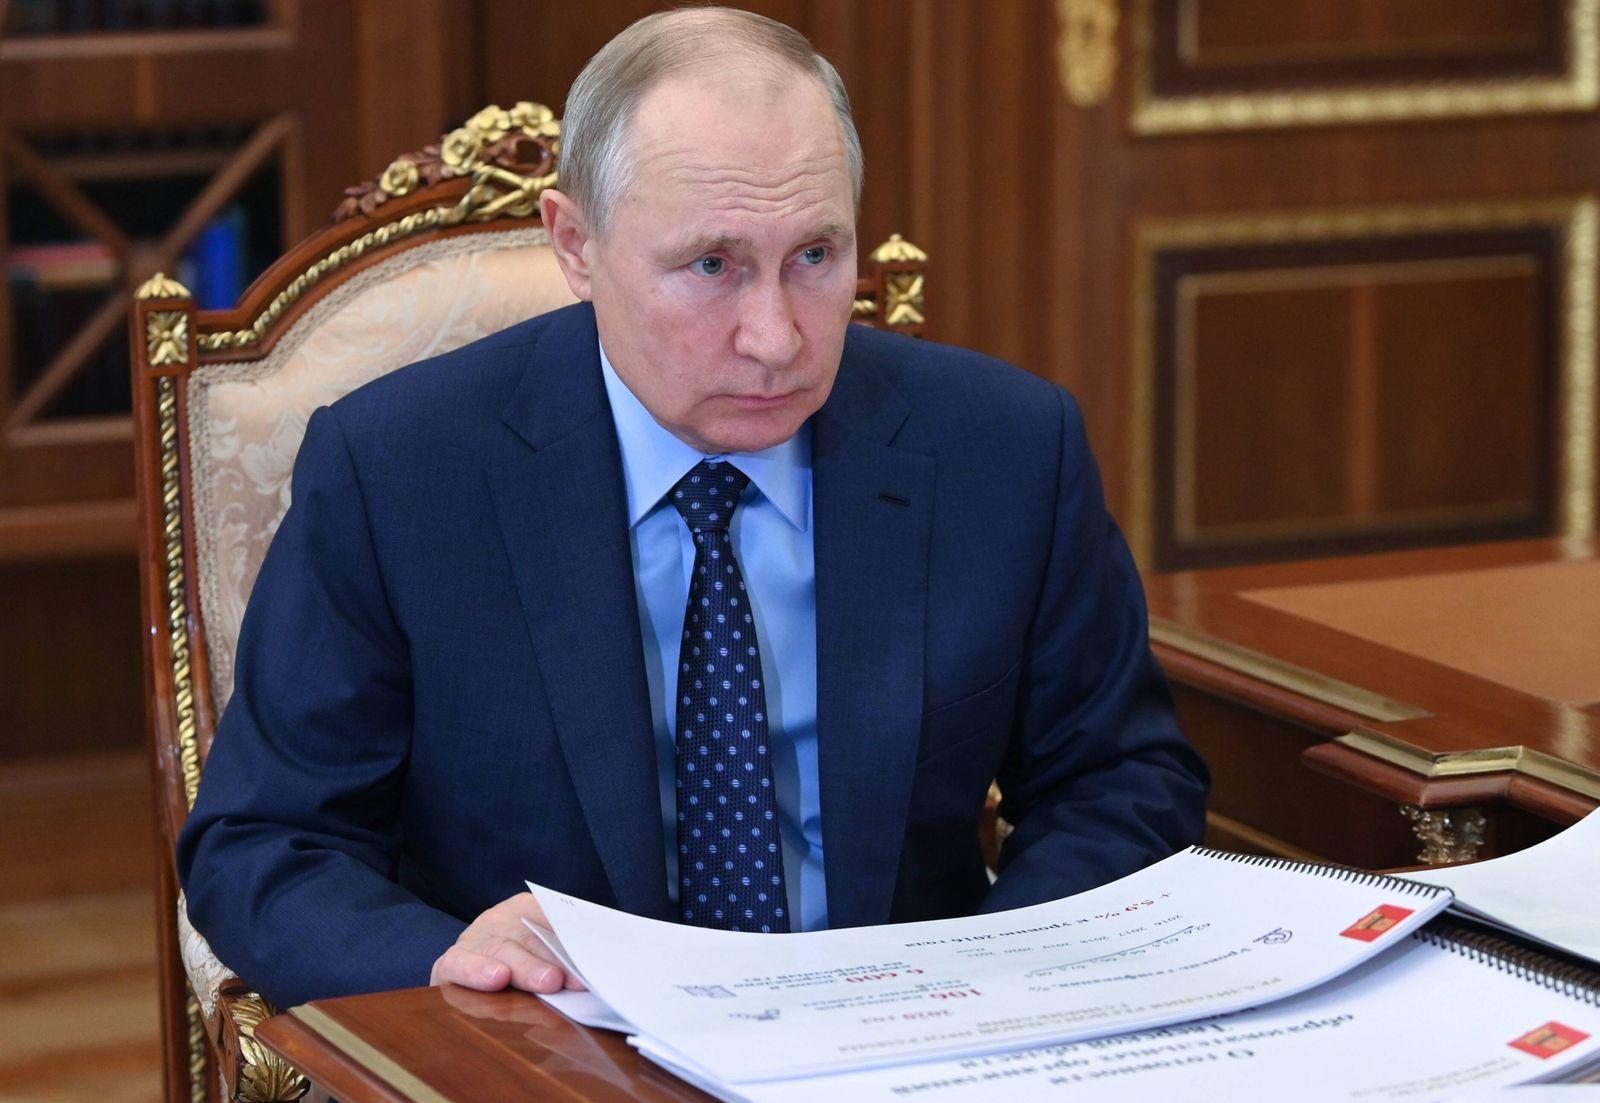 Russia Putin 6637368 30.08.2021 Russian President Vladimir Putin meets with Tver Region Governor Igor Rudenya, in Moscow